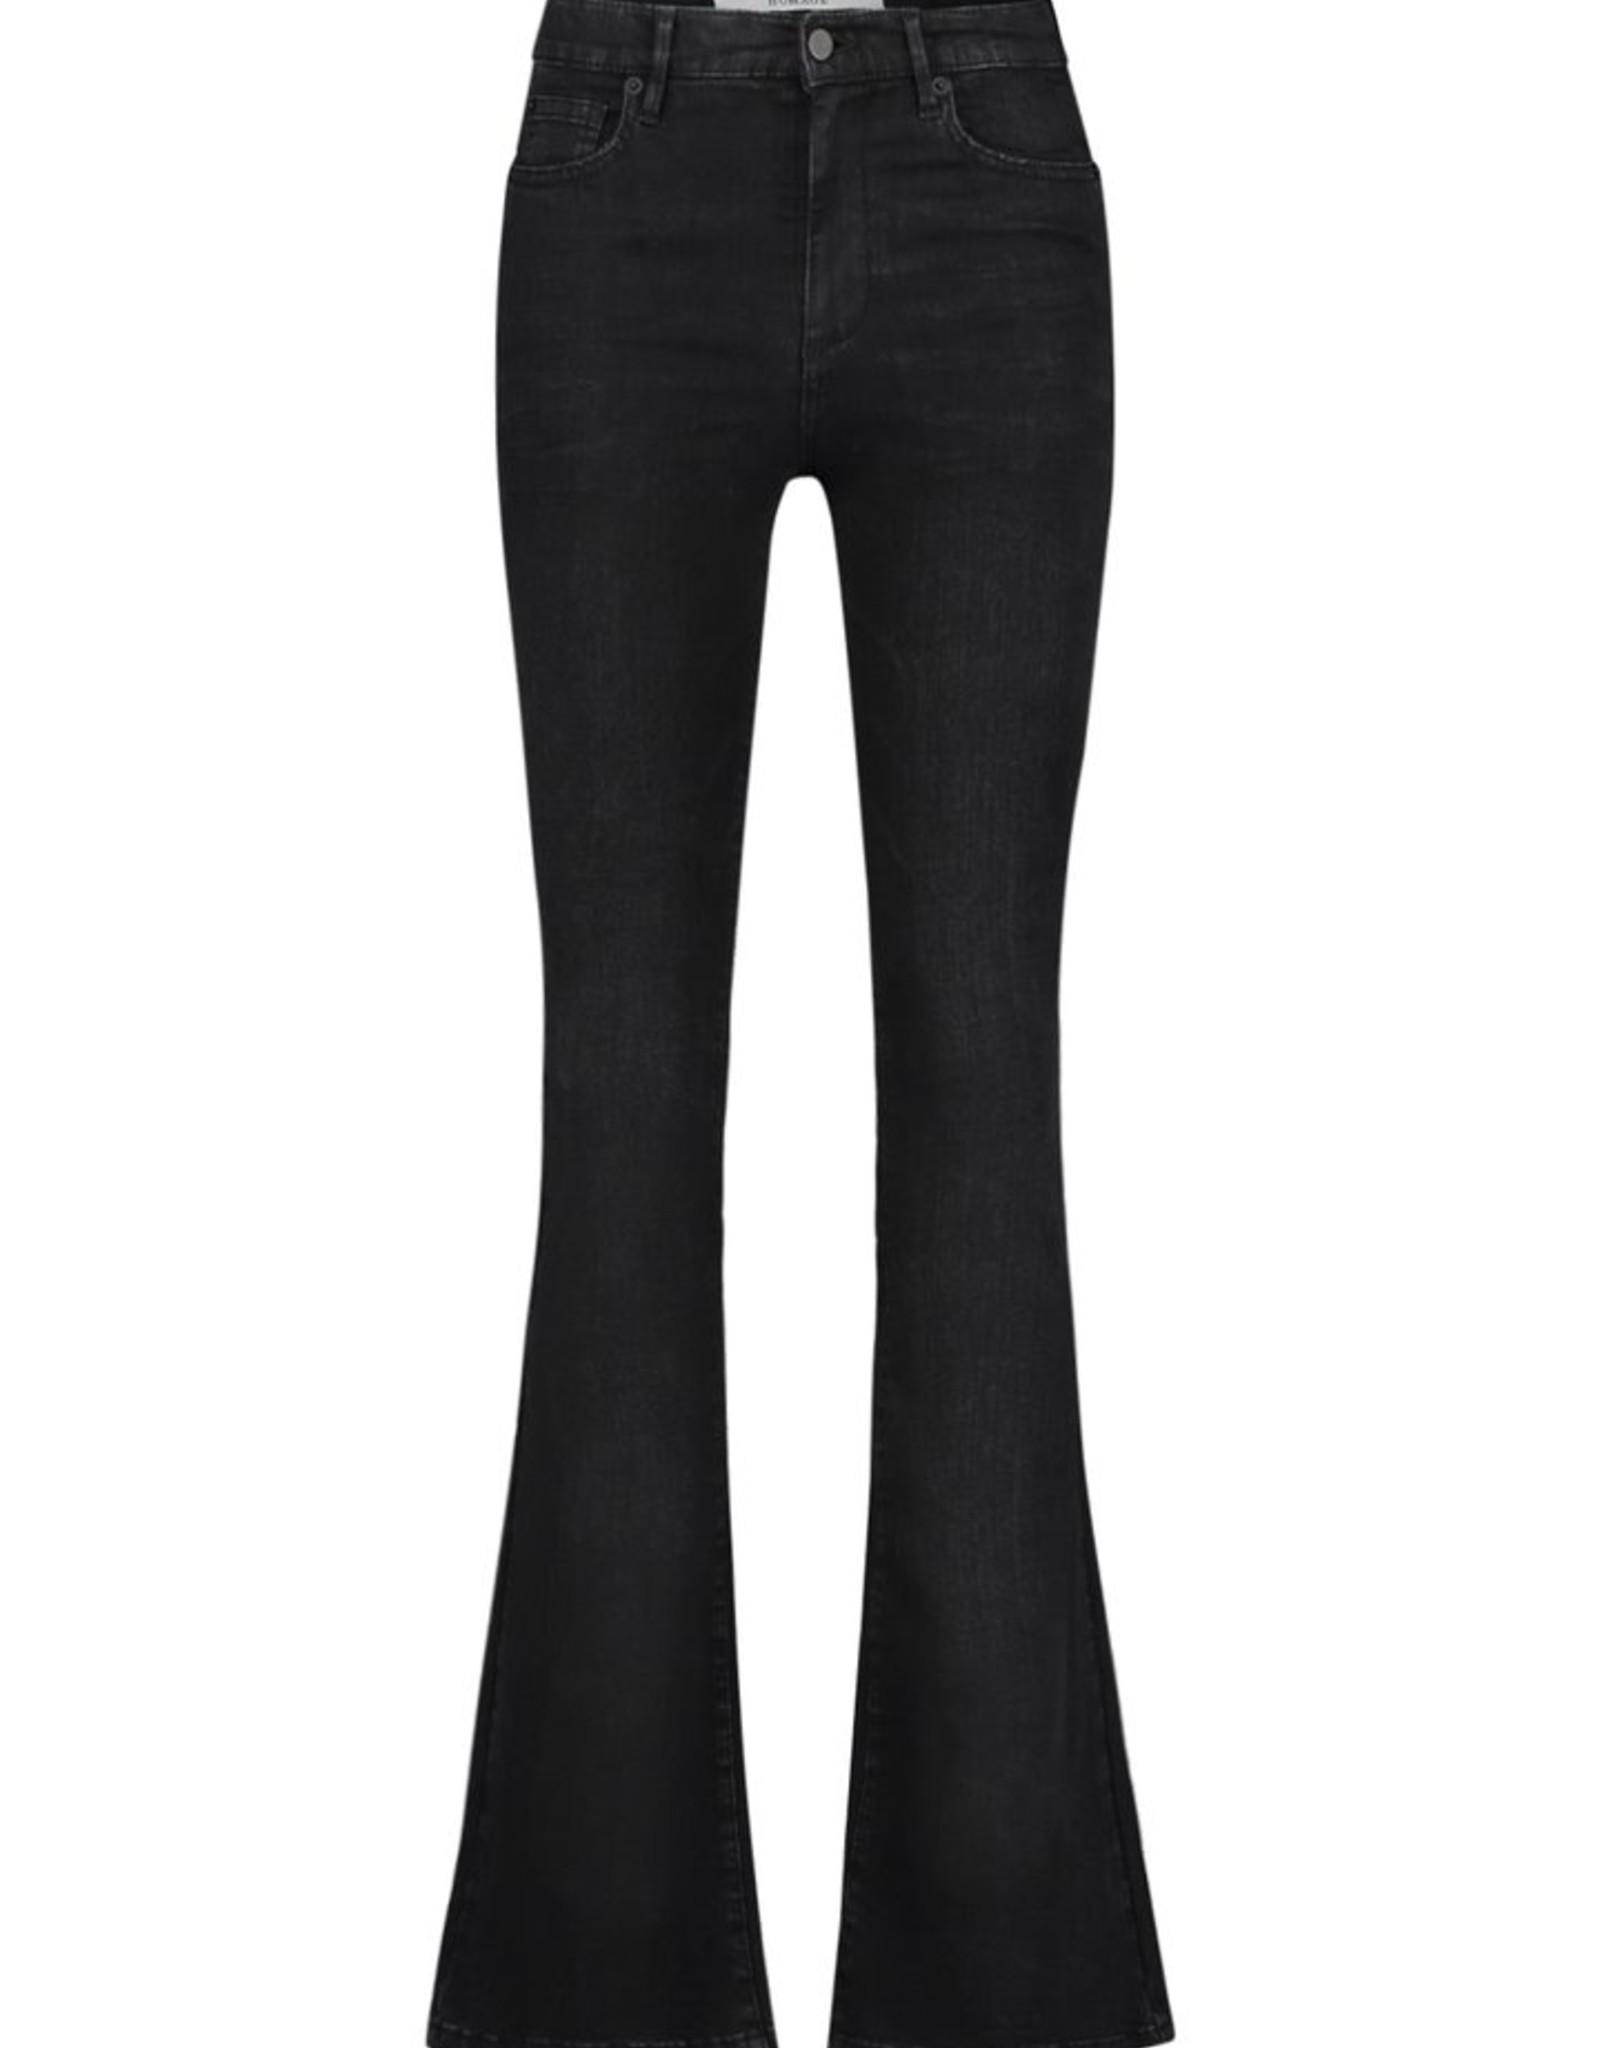 Homage Flared Jeans Black Used